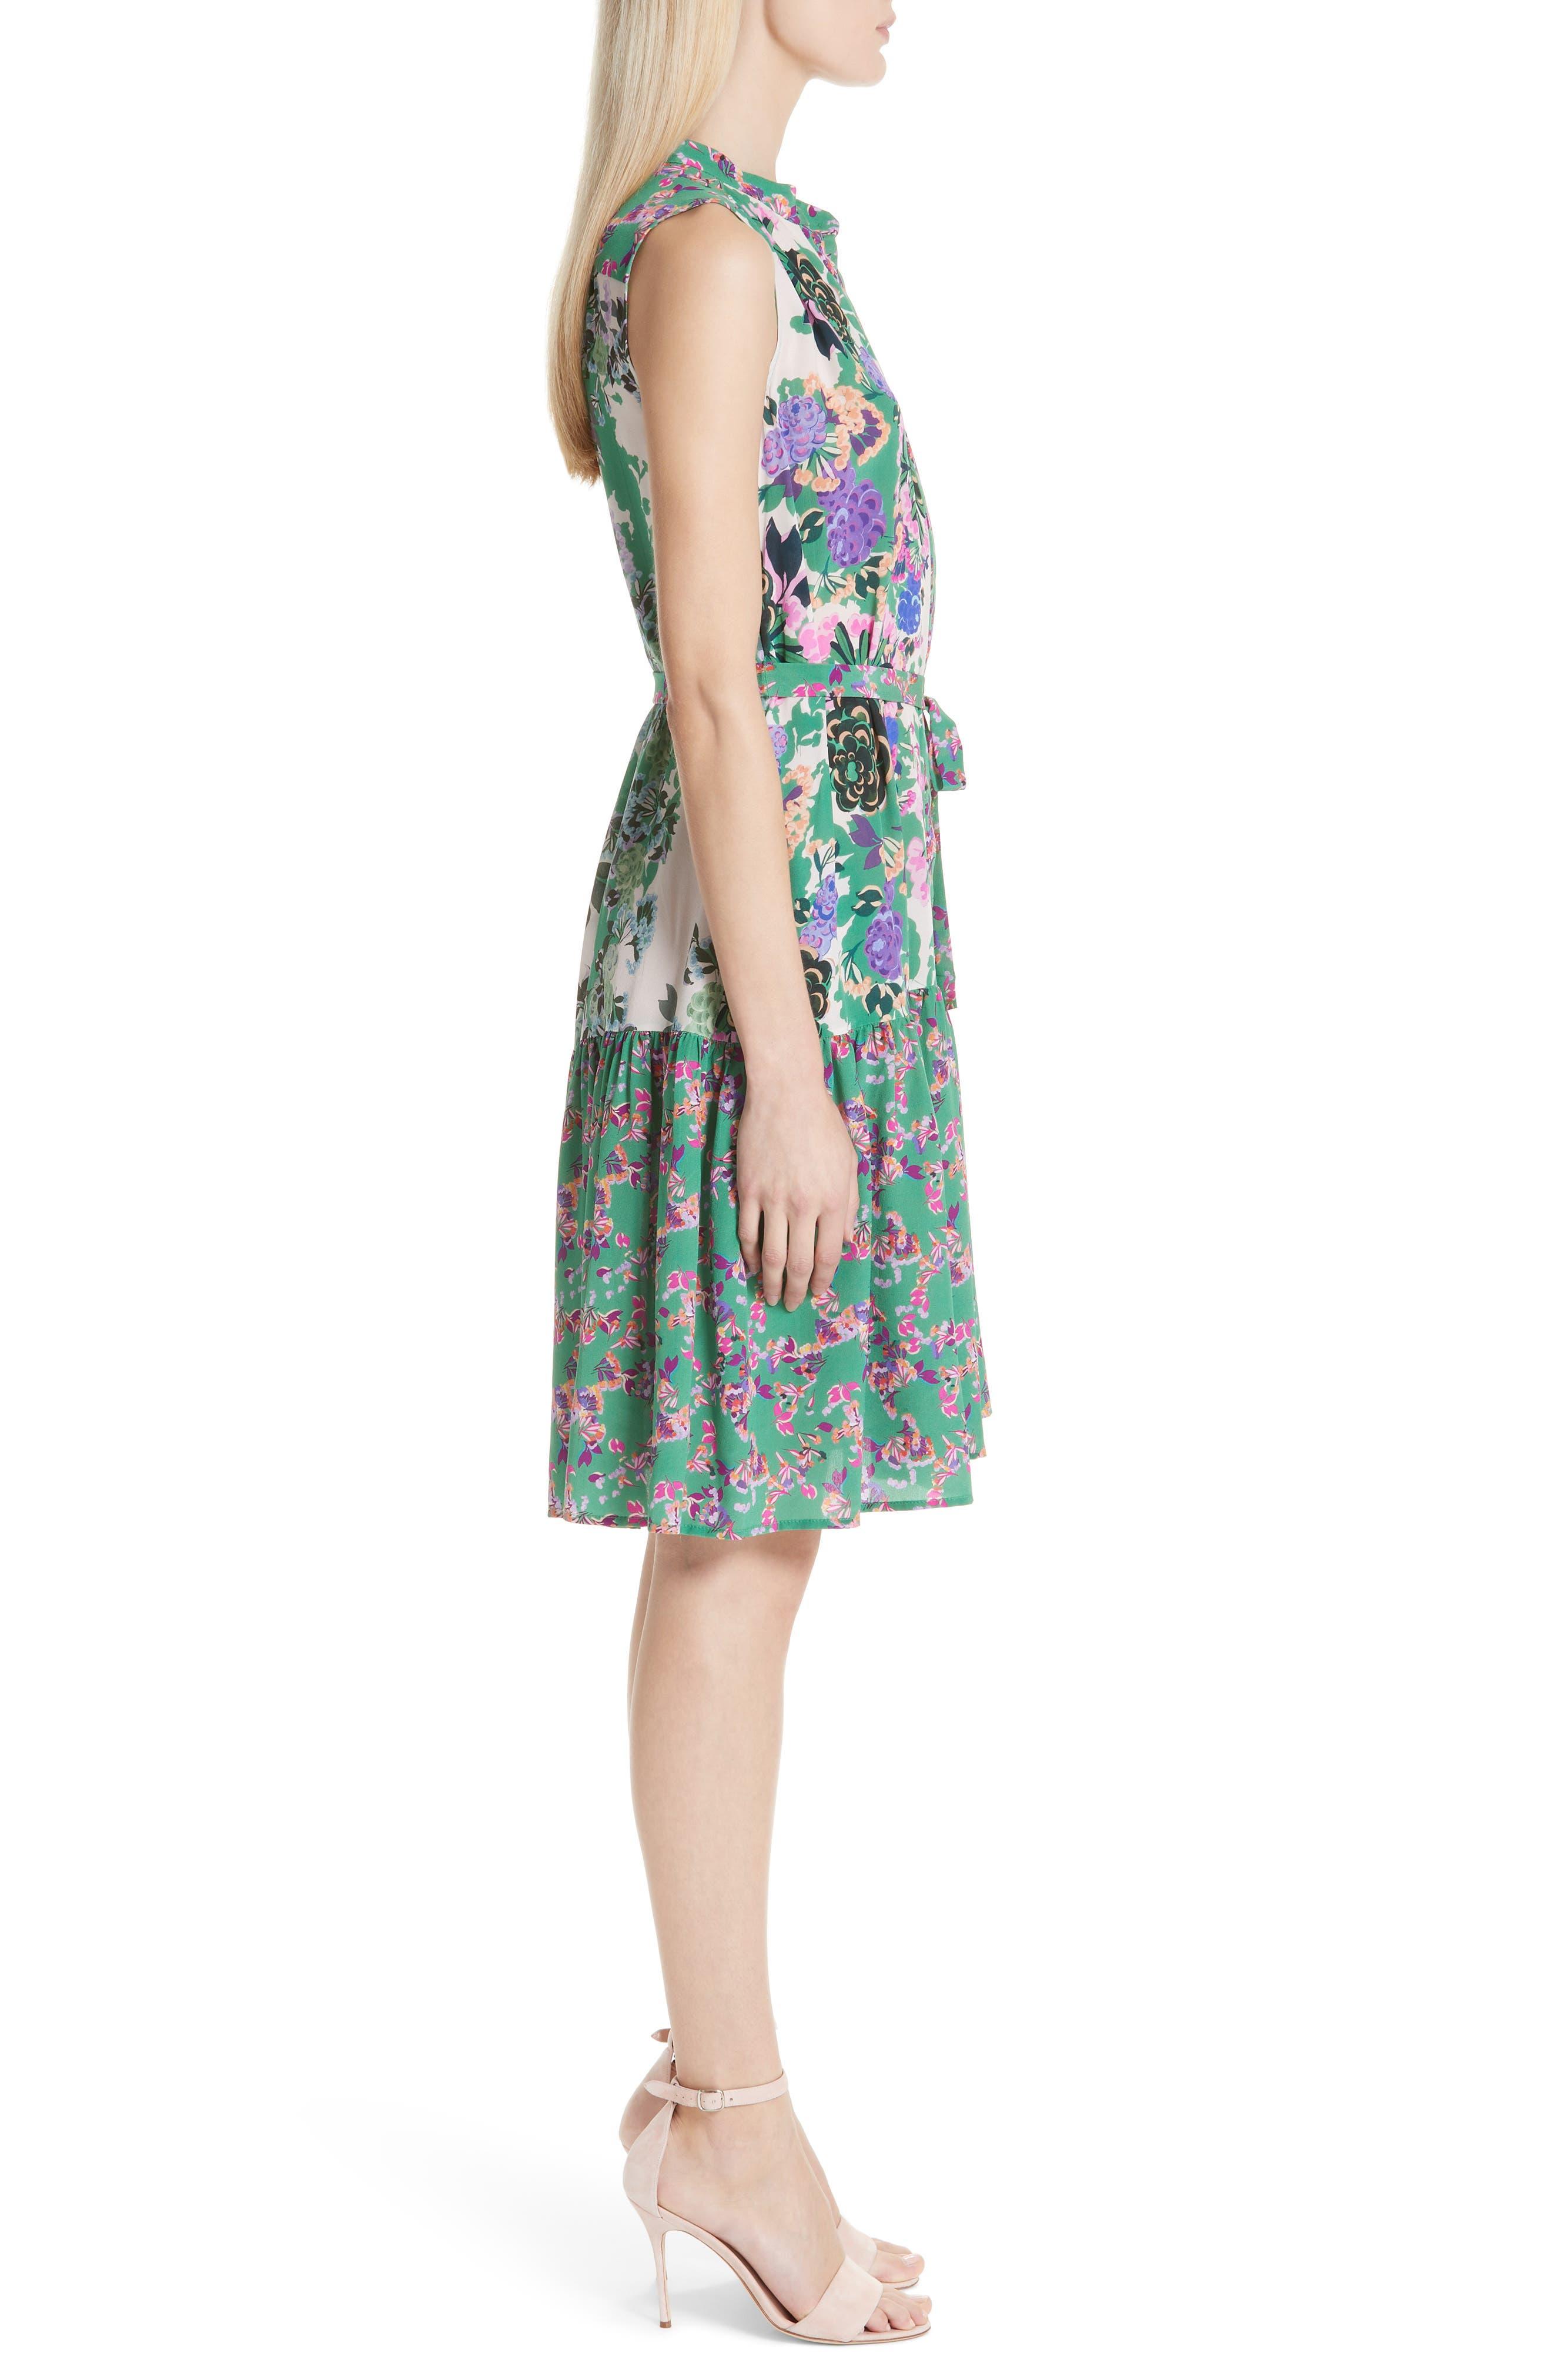 SALONI, Tilly Print Silk Dress, Alternate thumbnail 3, color, ROSE MEADOW PLMT